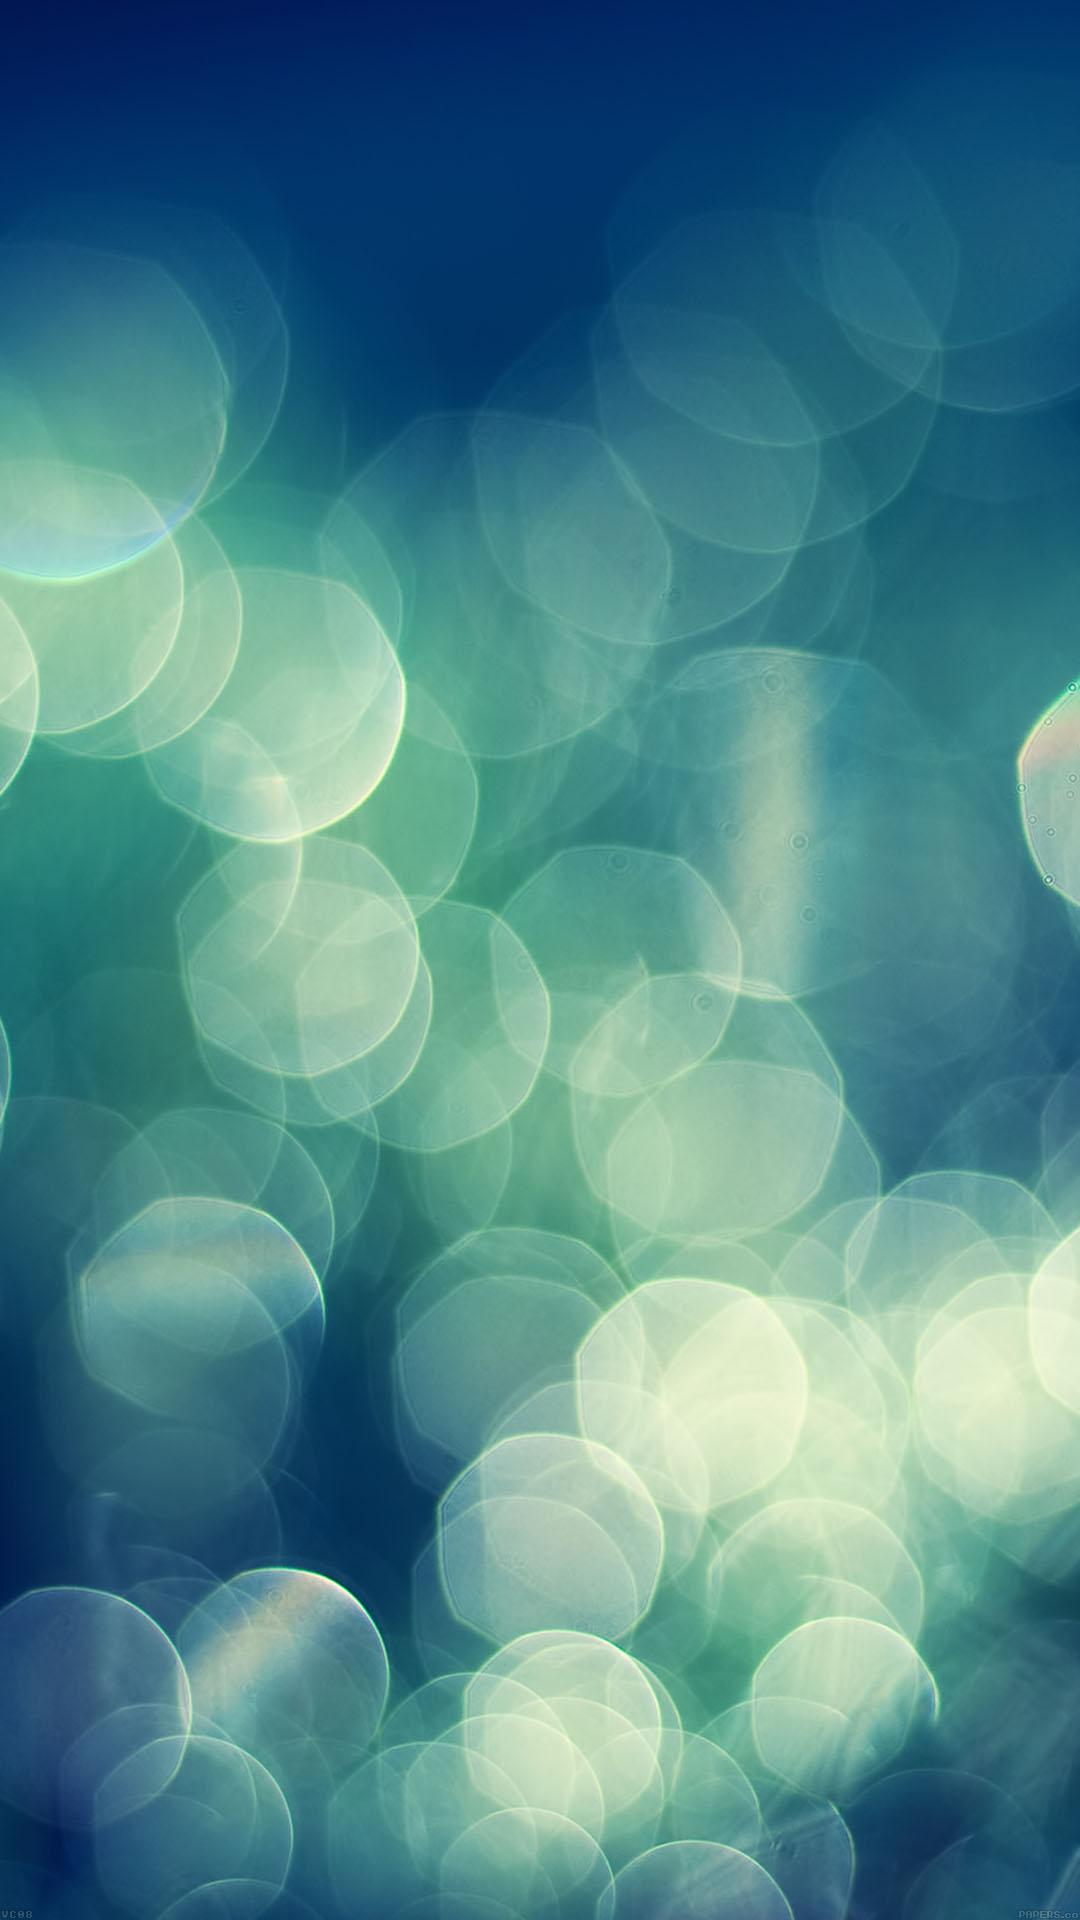 Bokeh Nature Lights Blur